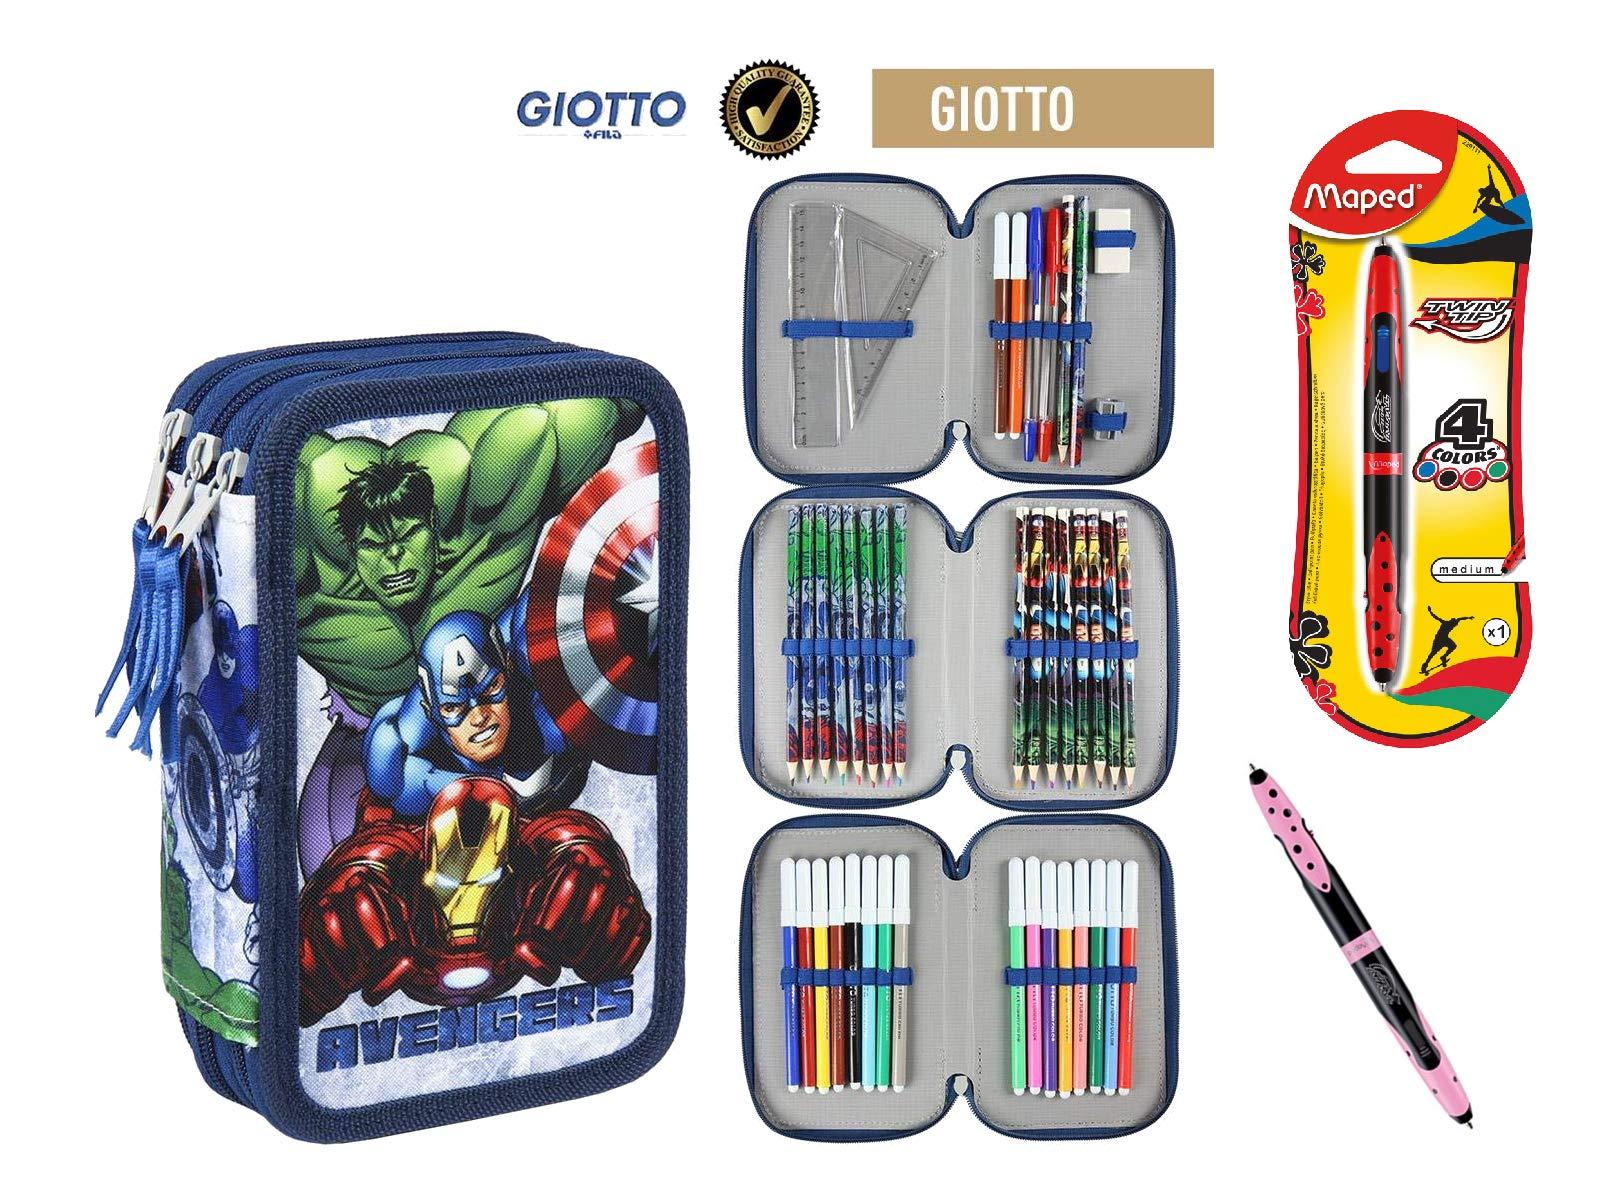 Cerdà Plumier Estuche Artesanía Premium de Cremallera Triple 3 Pisos Avengers – 43 Piezas Contenido Giotto + Regalo